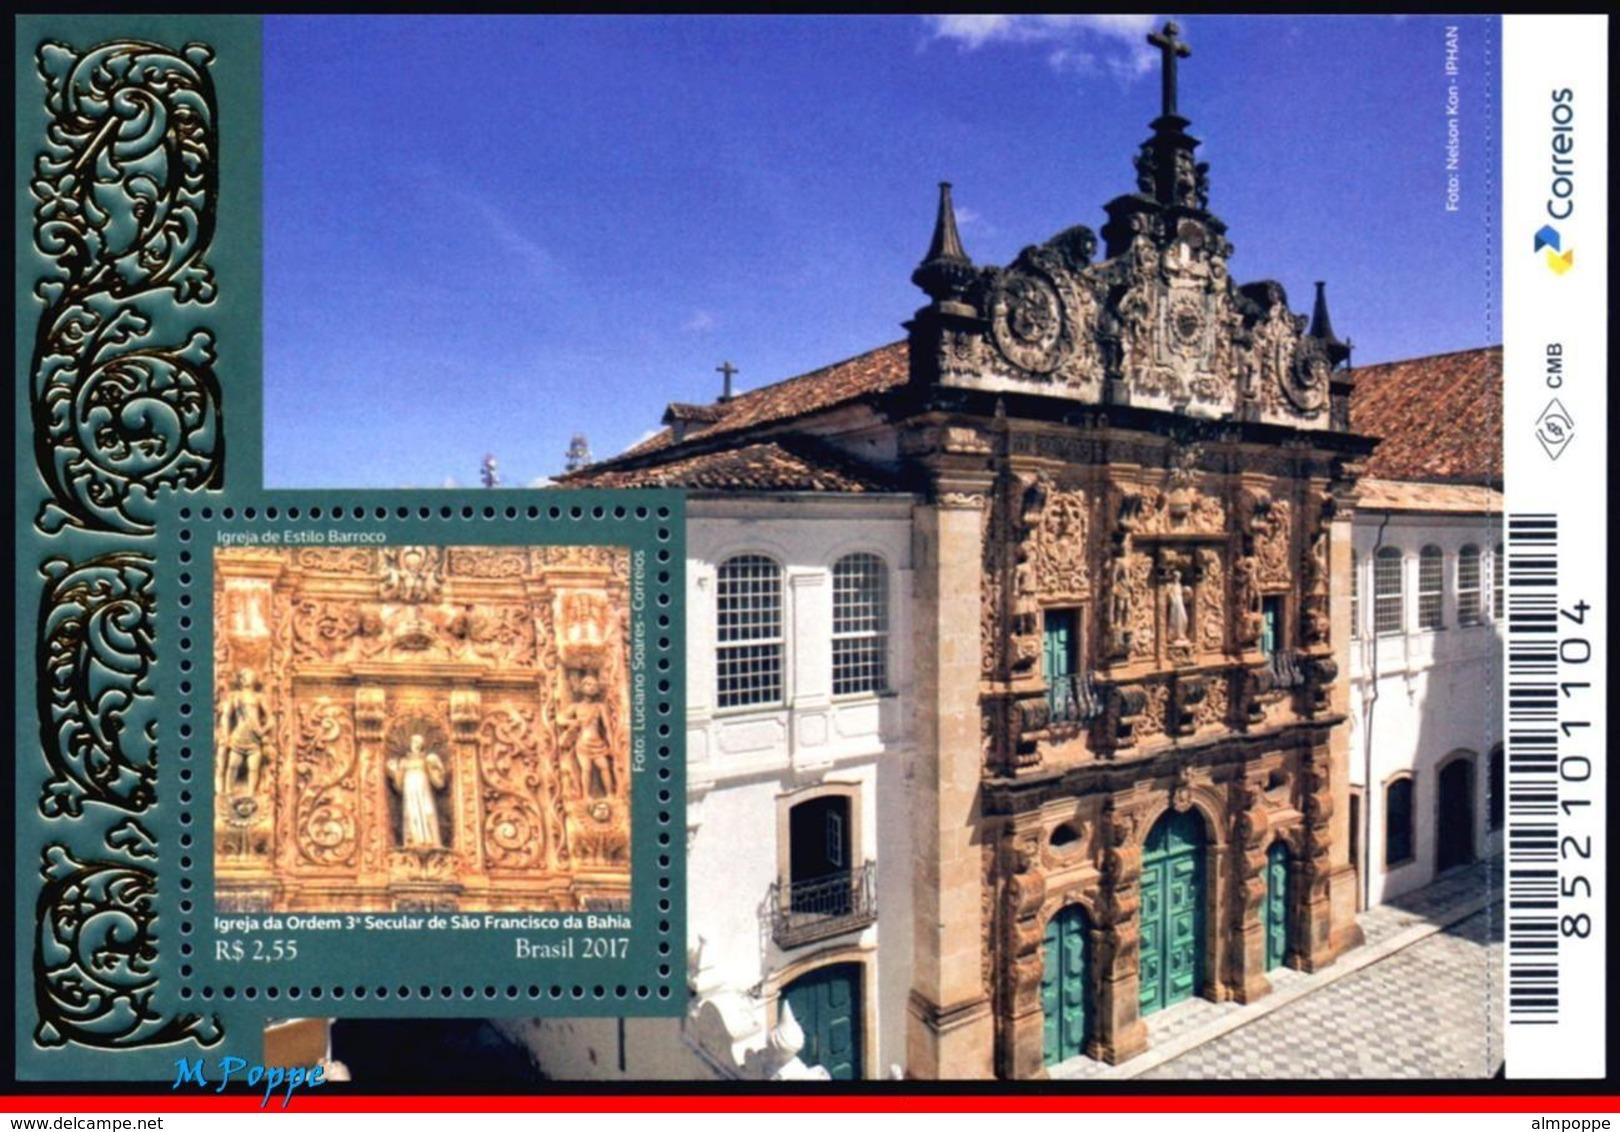 Ref. BR-V2017-23 BRAZIL 2017 CHURCHES, BAROQUE STYLE CHURCH,, RELIGION, ARCHITECTURE, S/S MNH 1V - Ungebraucht